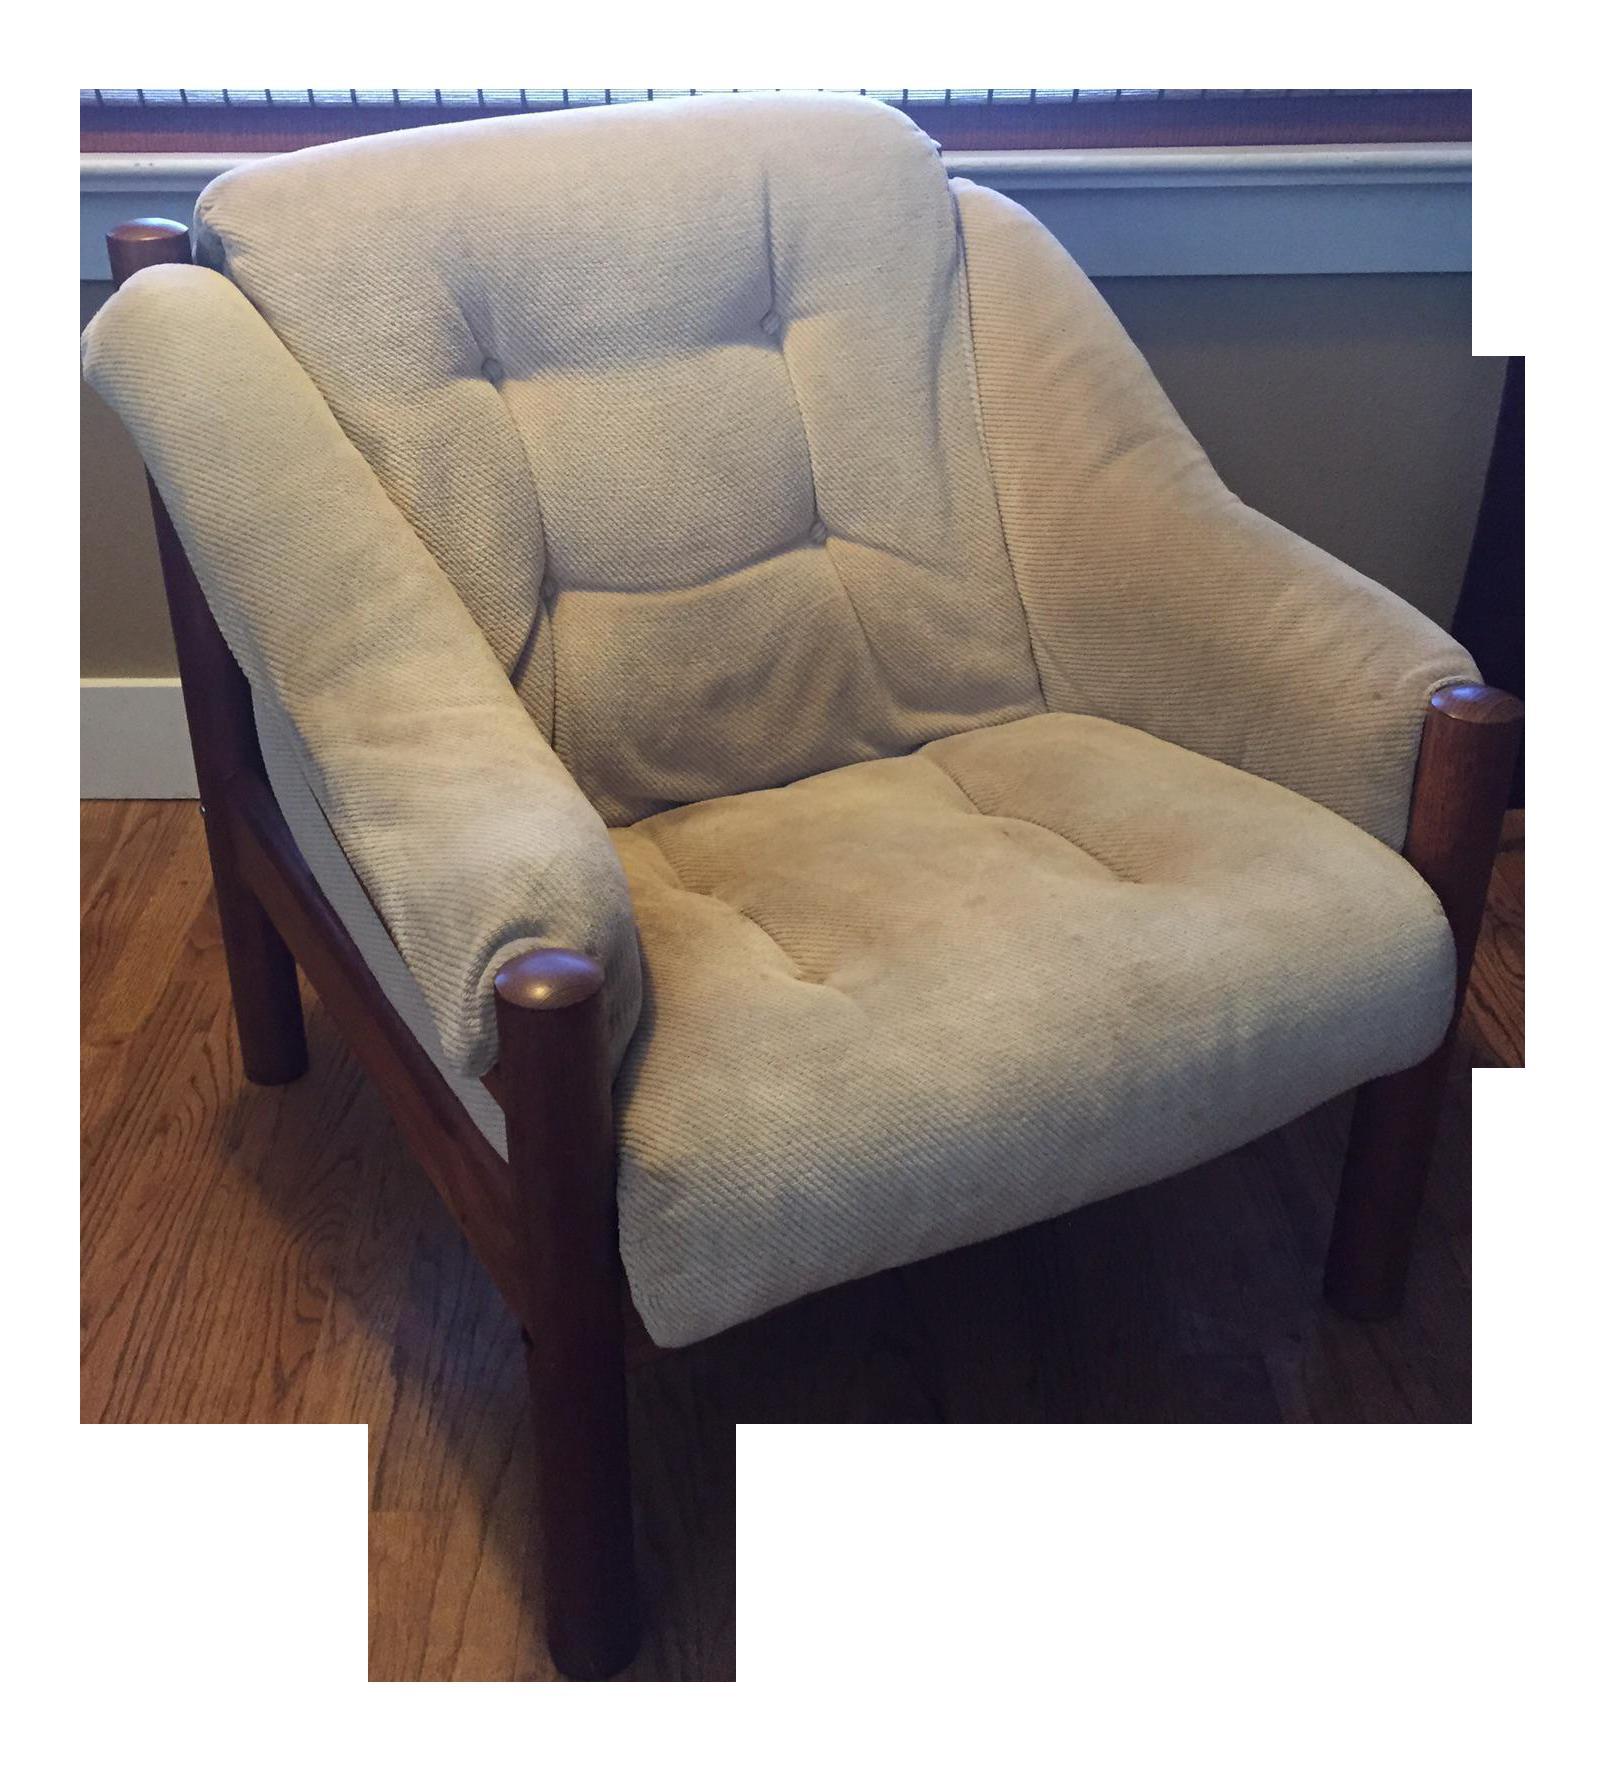 Domino Mobler Danish Modern Teak Lounge Chair 3 Available